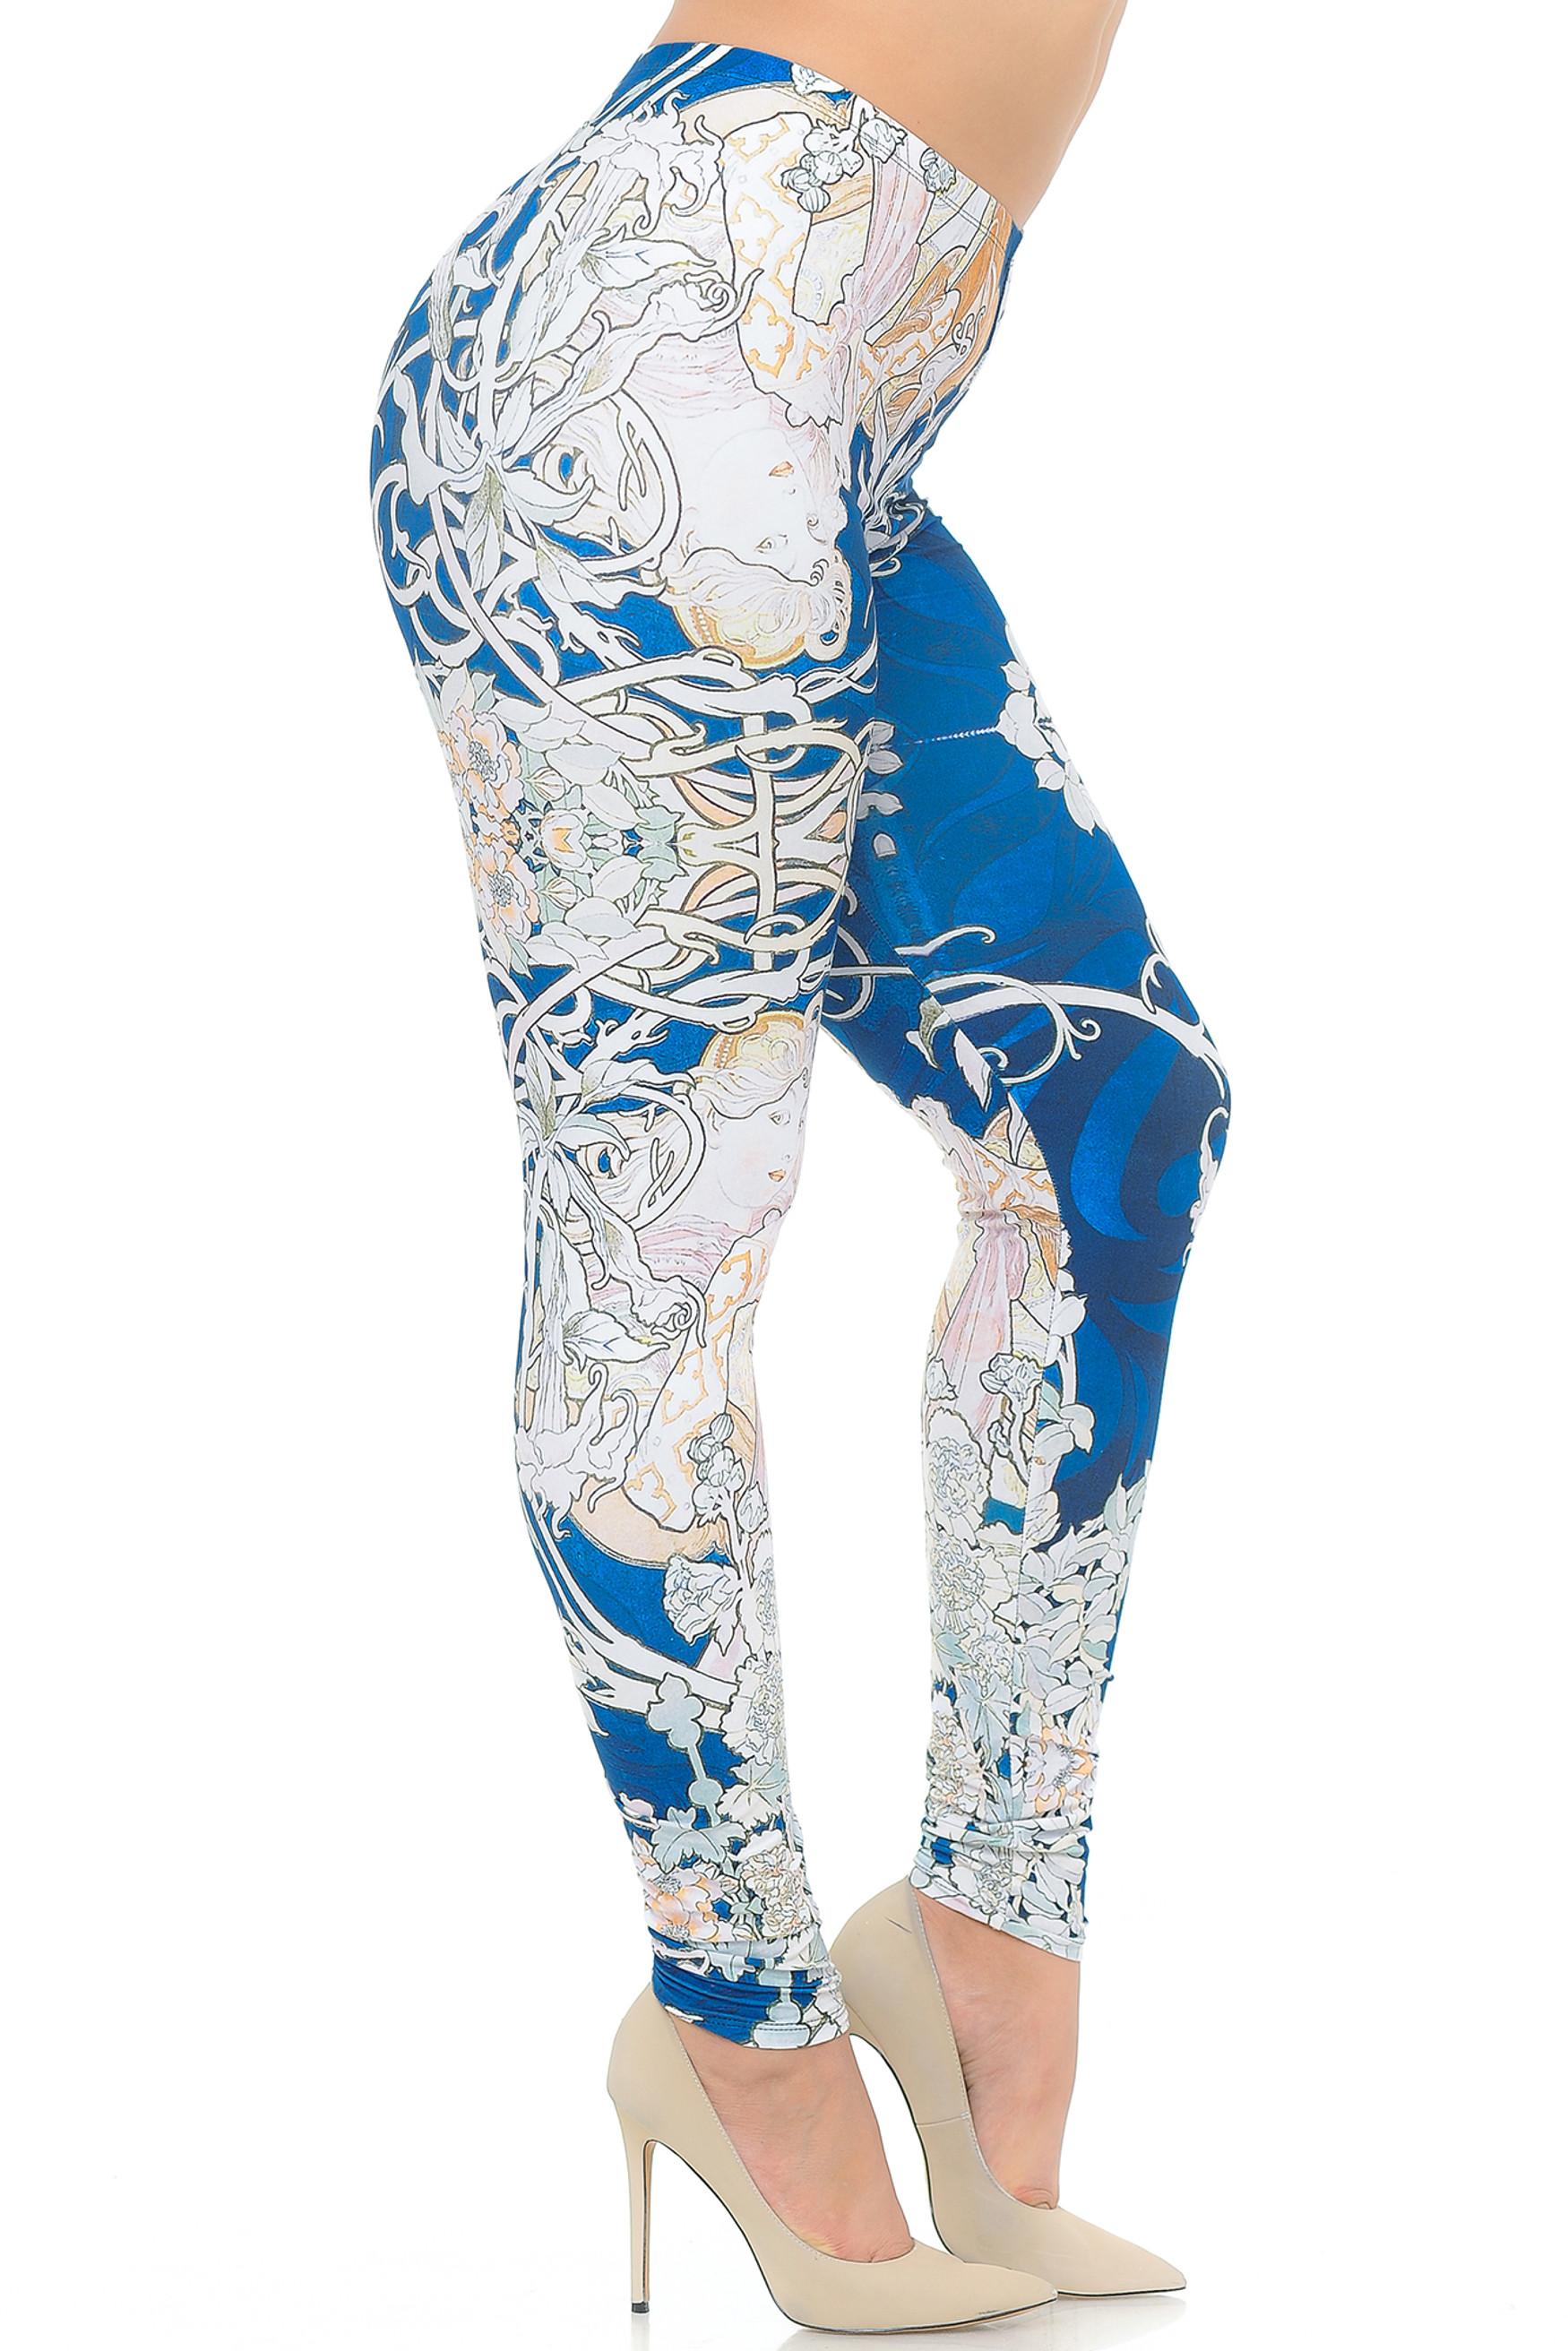 Creamy Soft Twisted Eden Vine Plus Size Extra Plus Size Leggings - 3X-5X - USA Fashion™